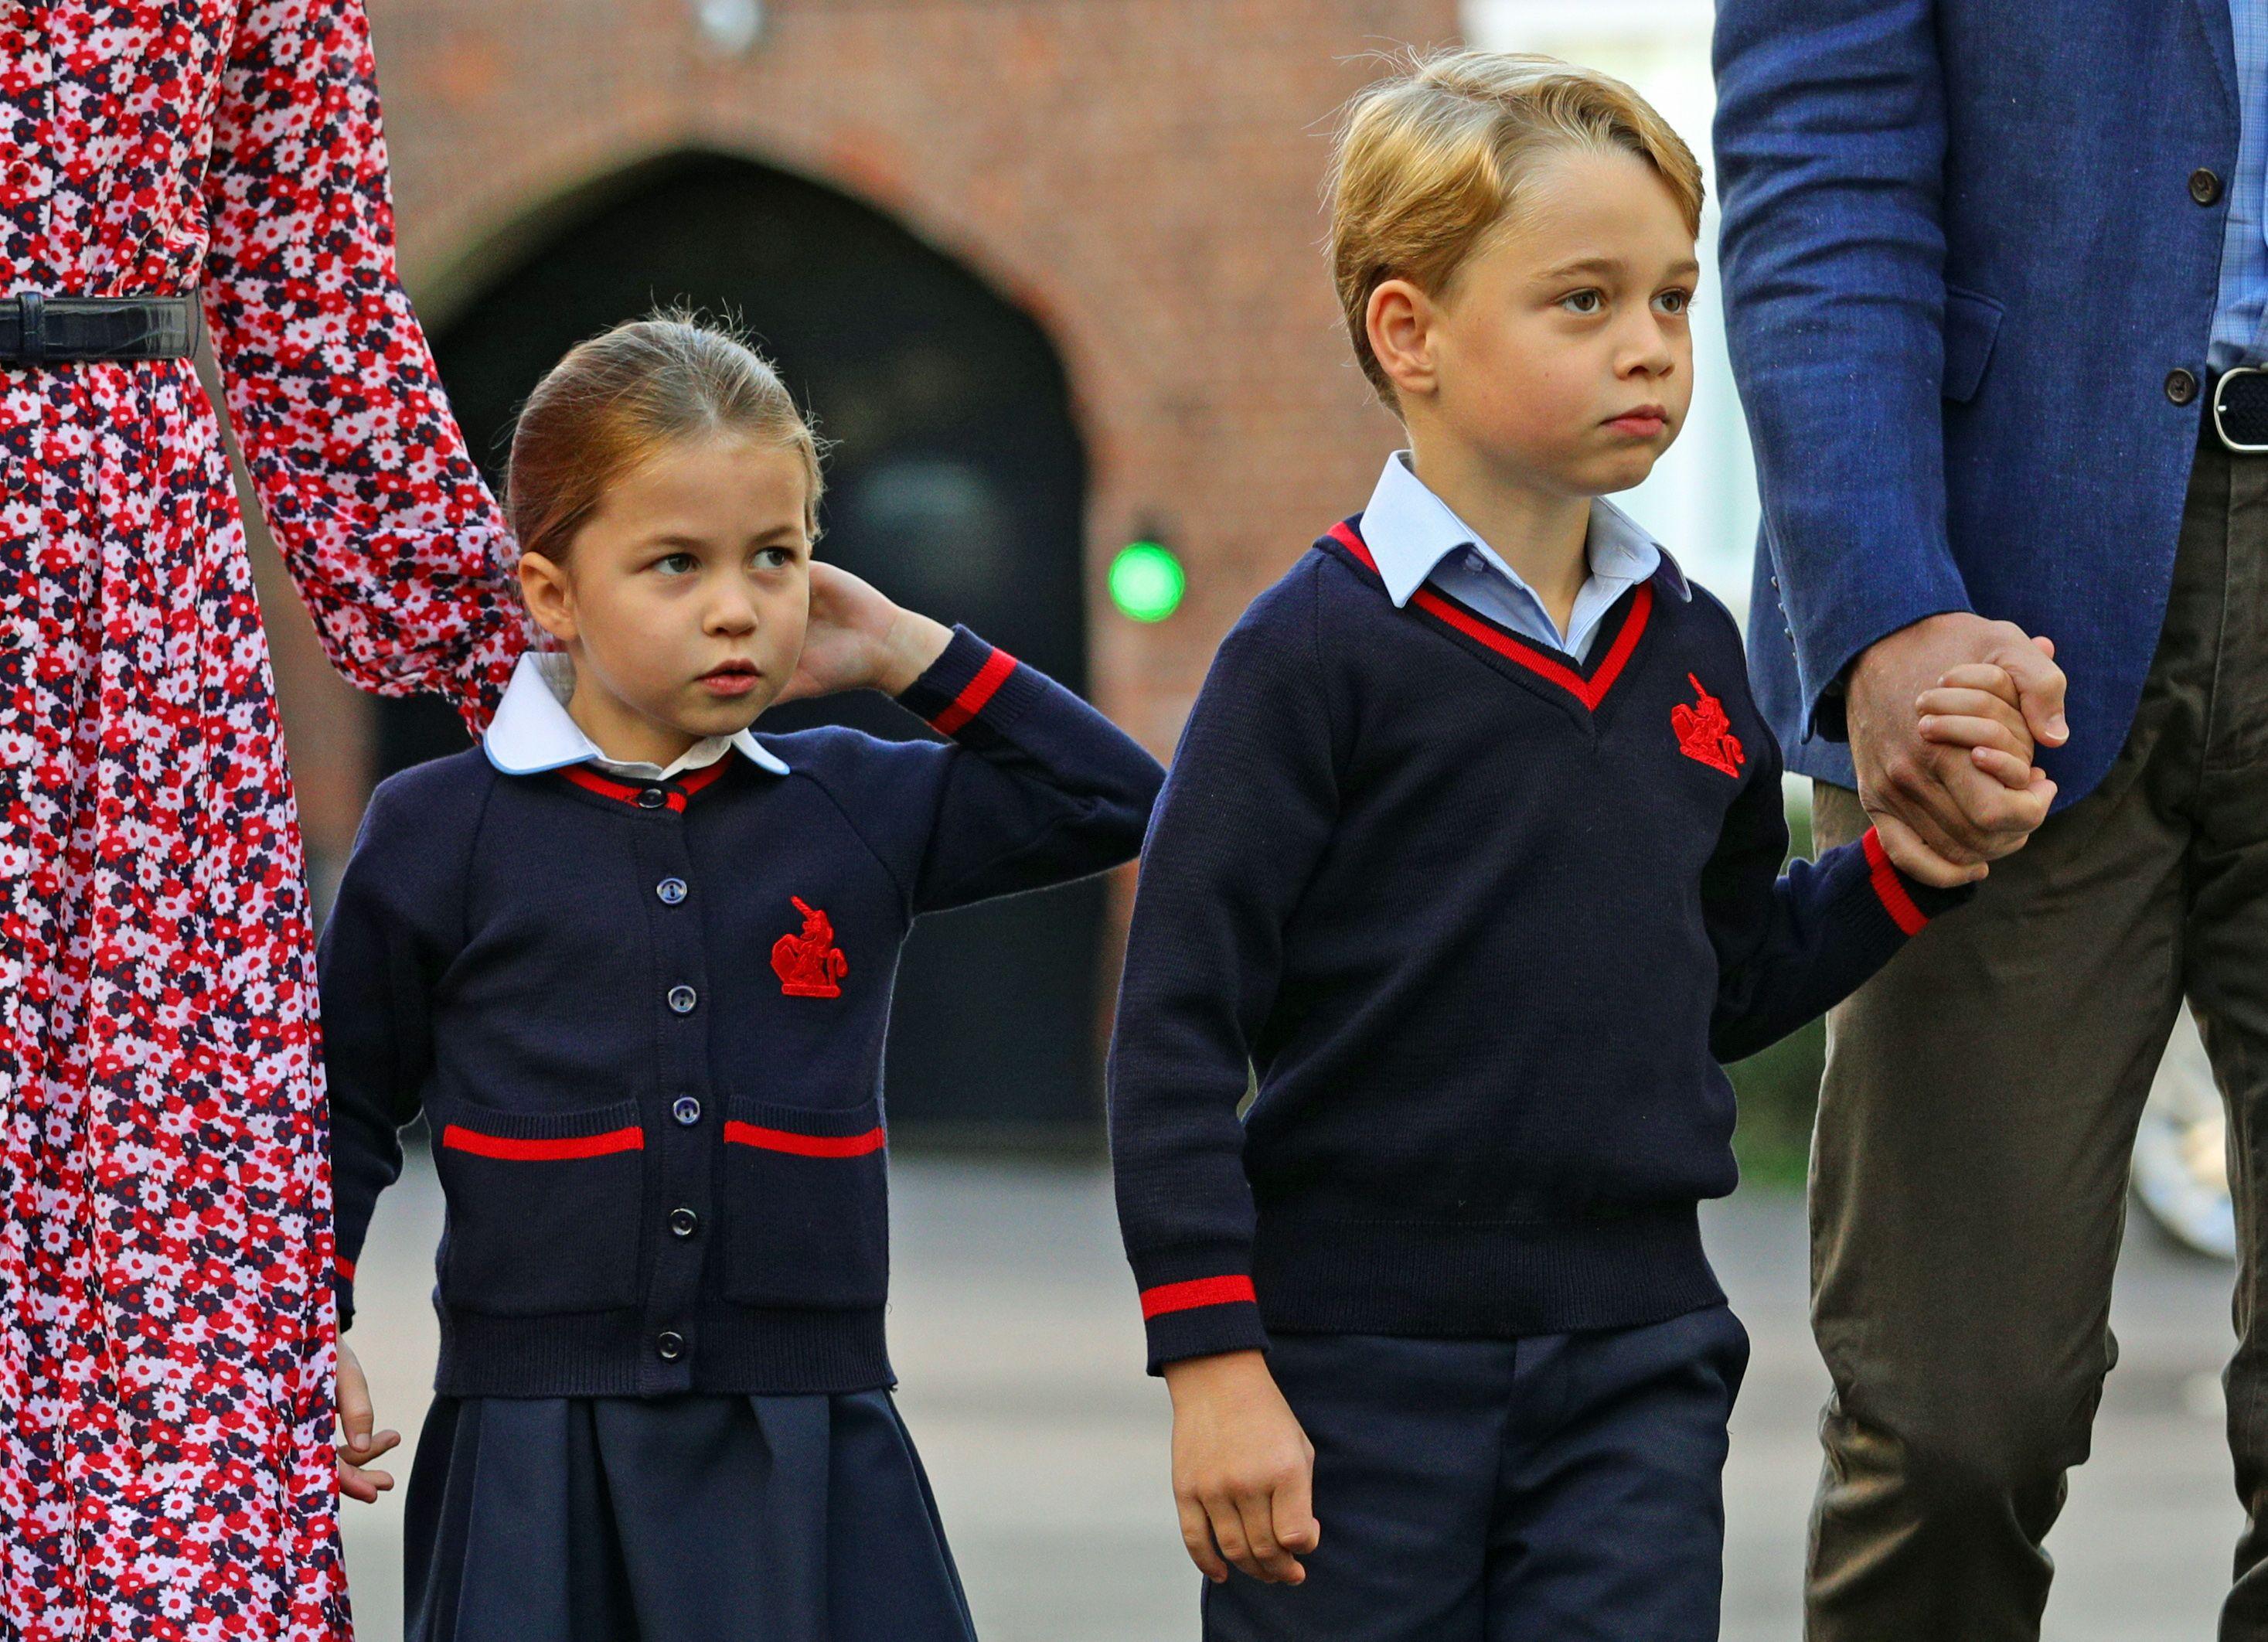 How British Royal Family Is Impacted by Coronavirus